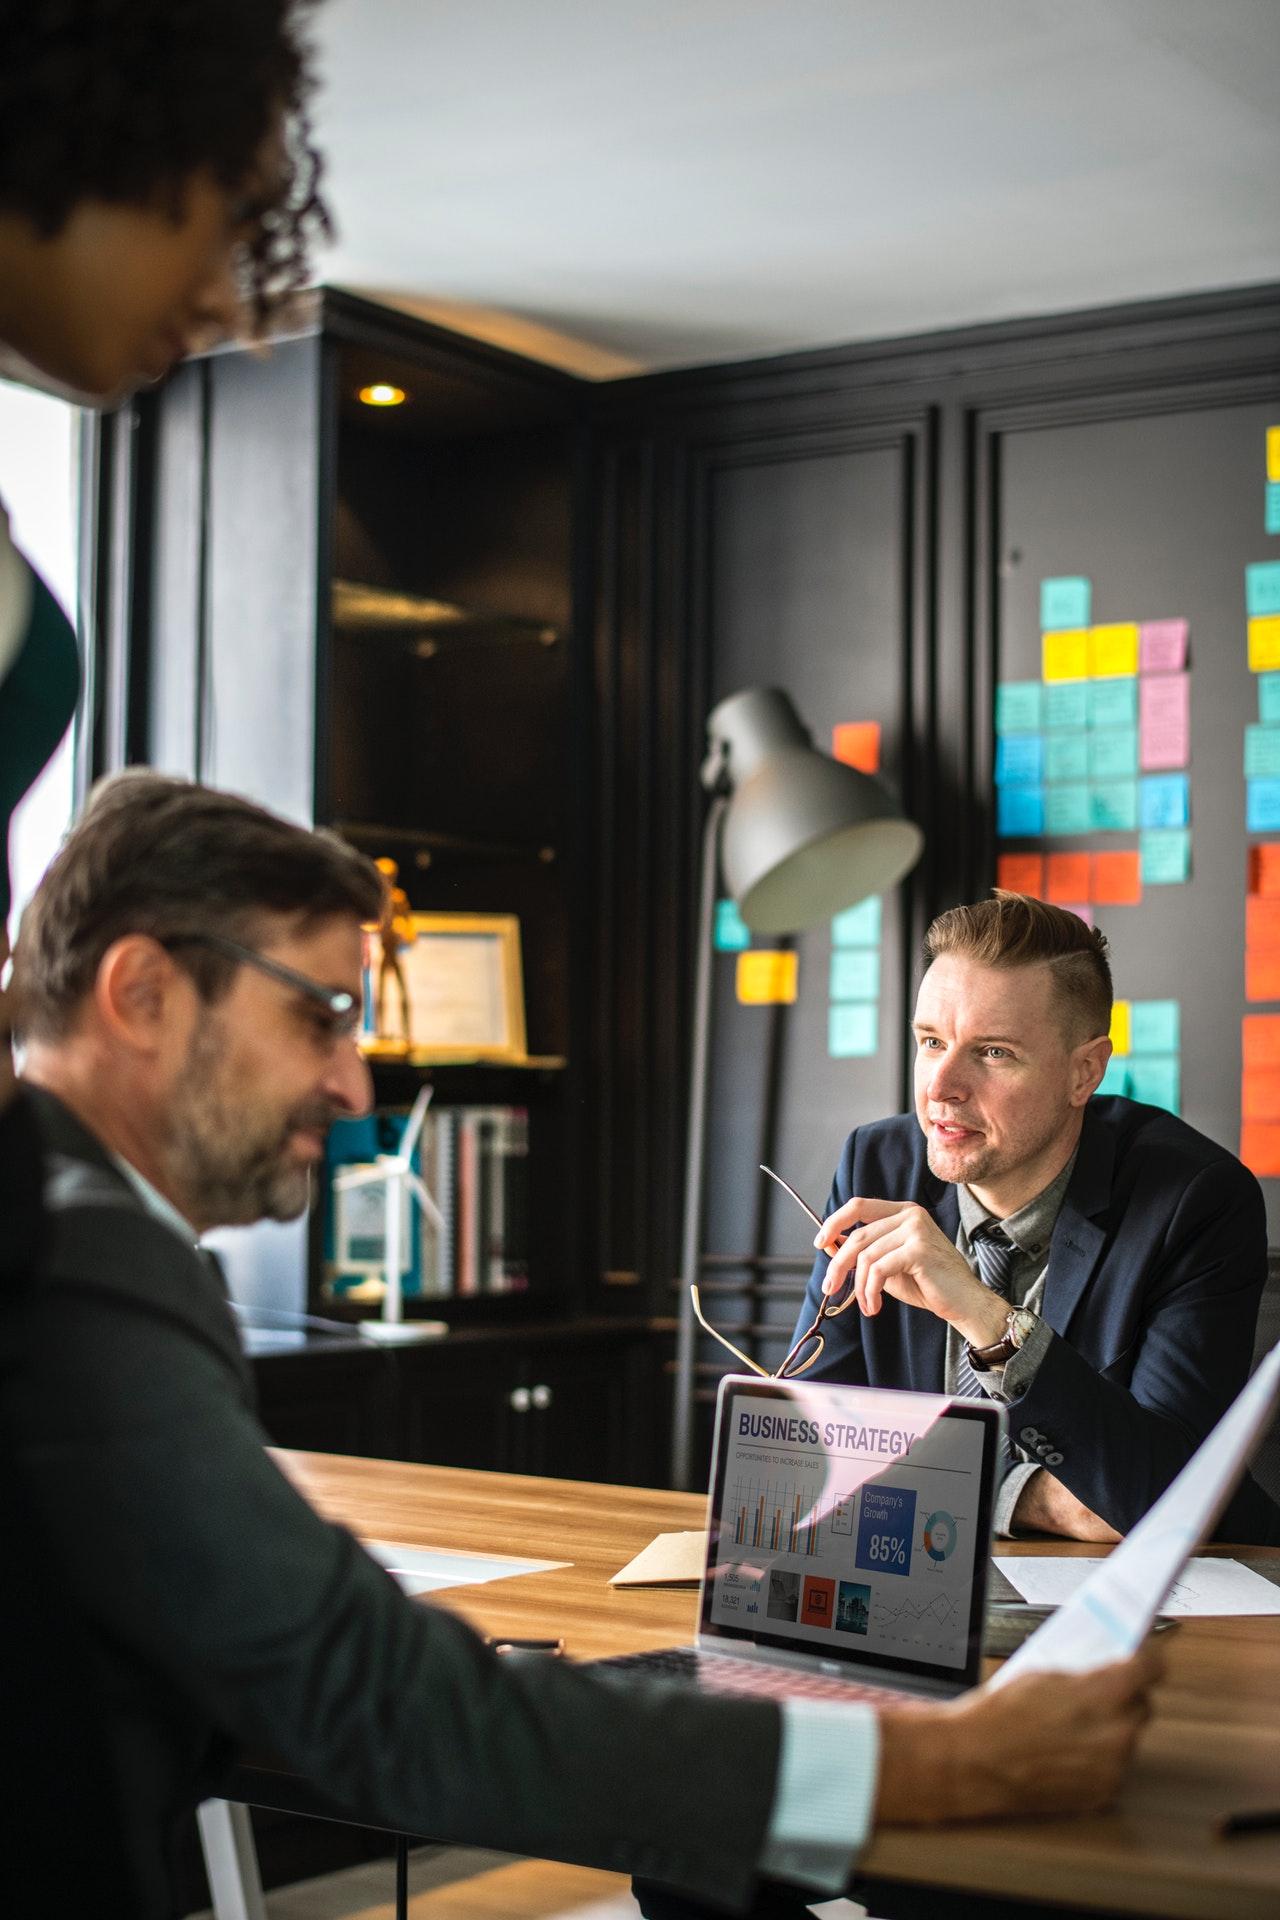 analyzing-brainstorming-business-1080853.jpg